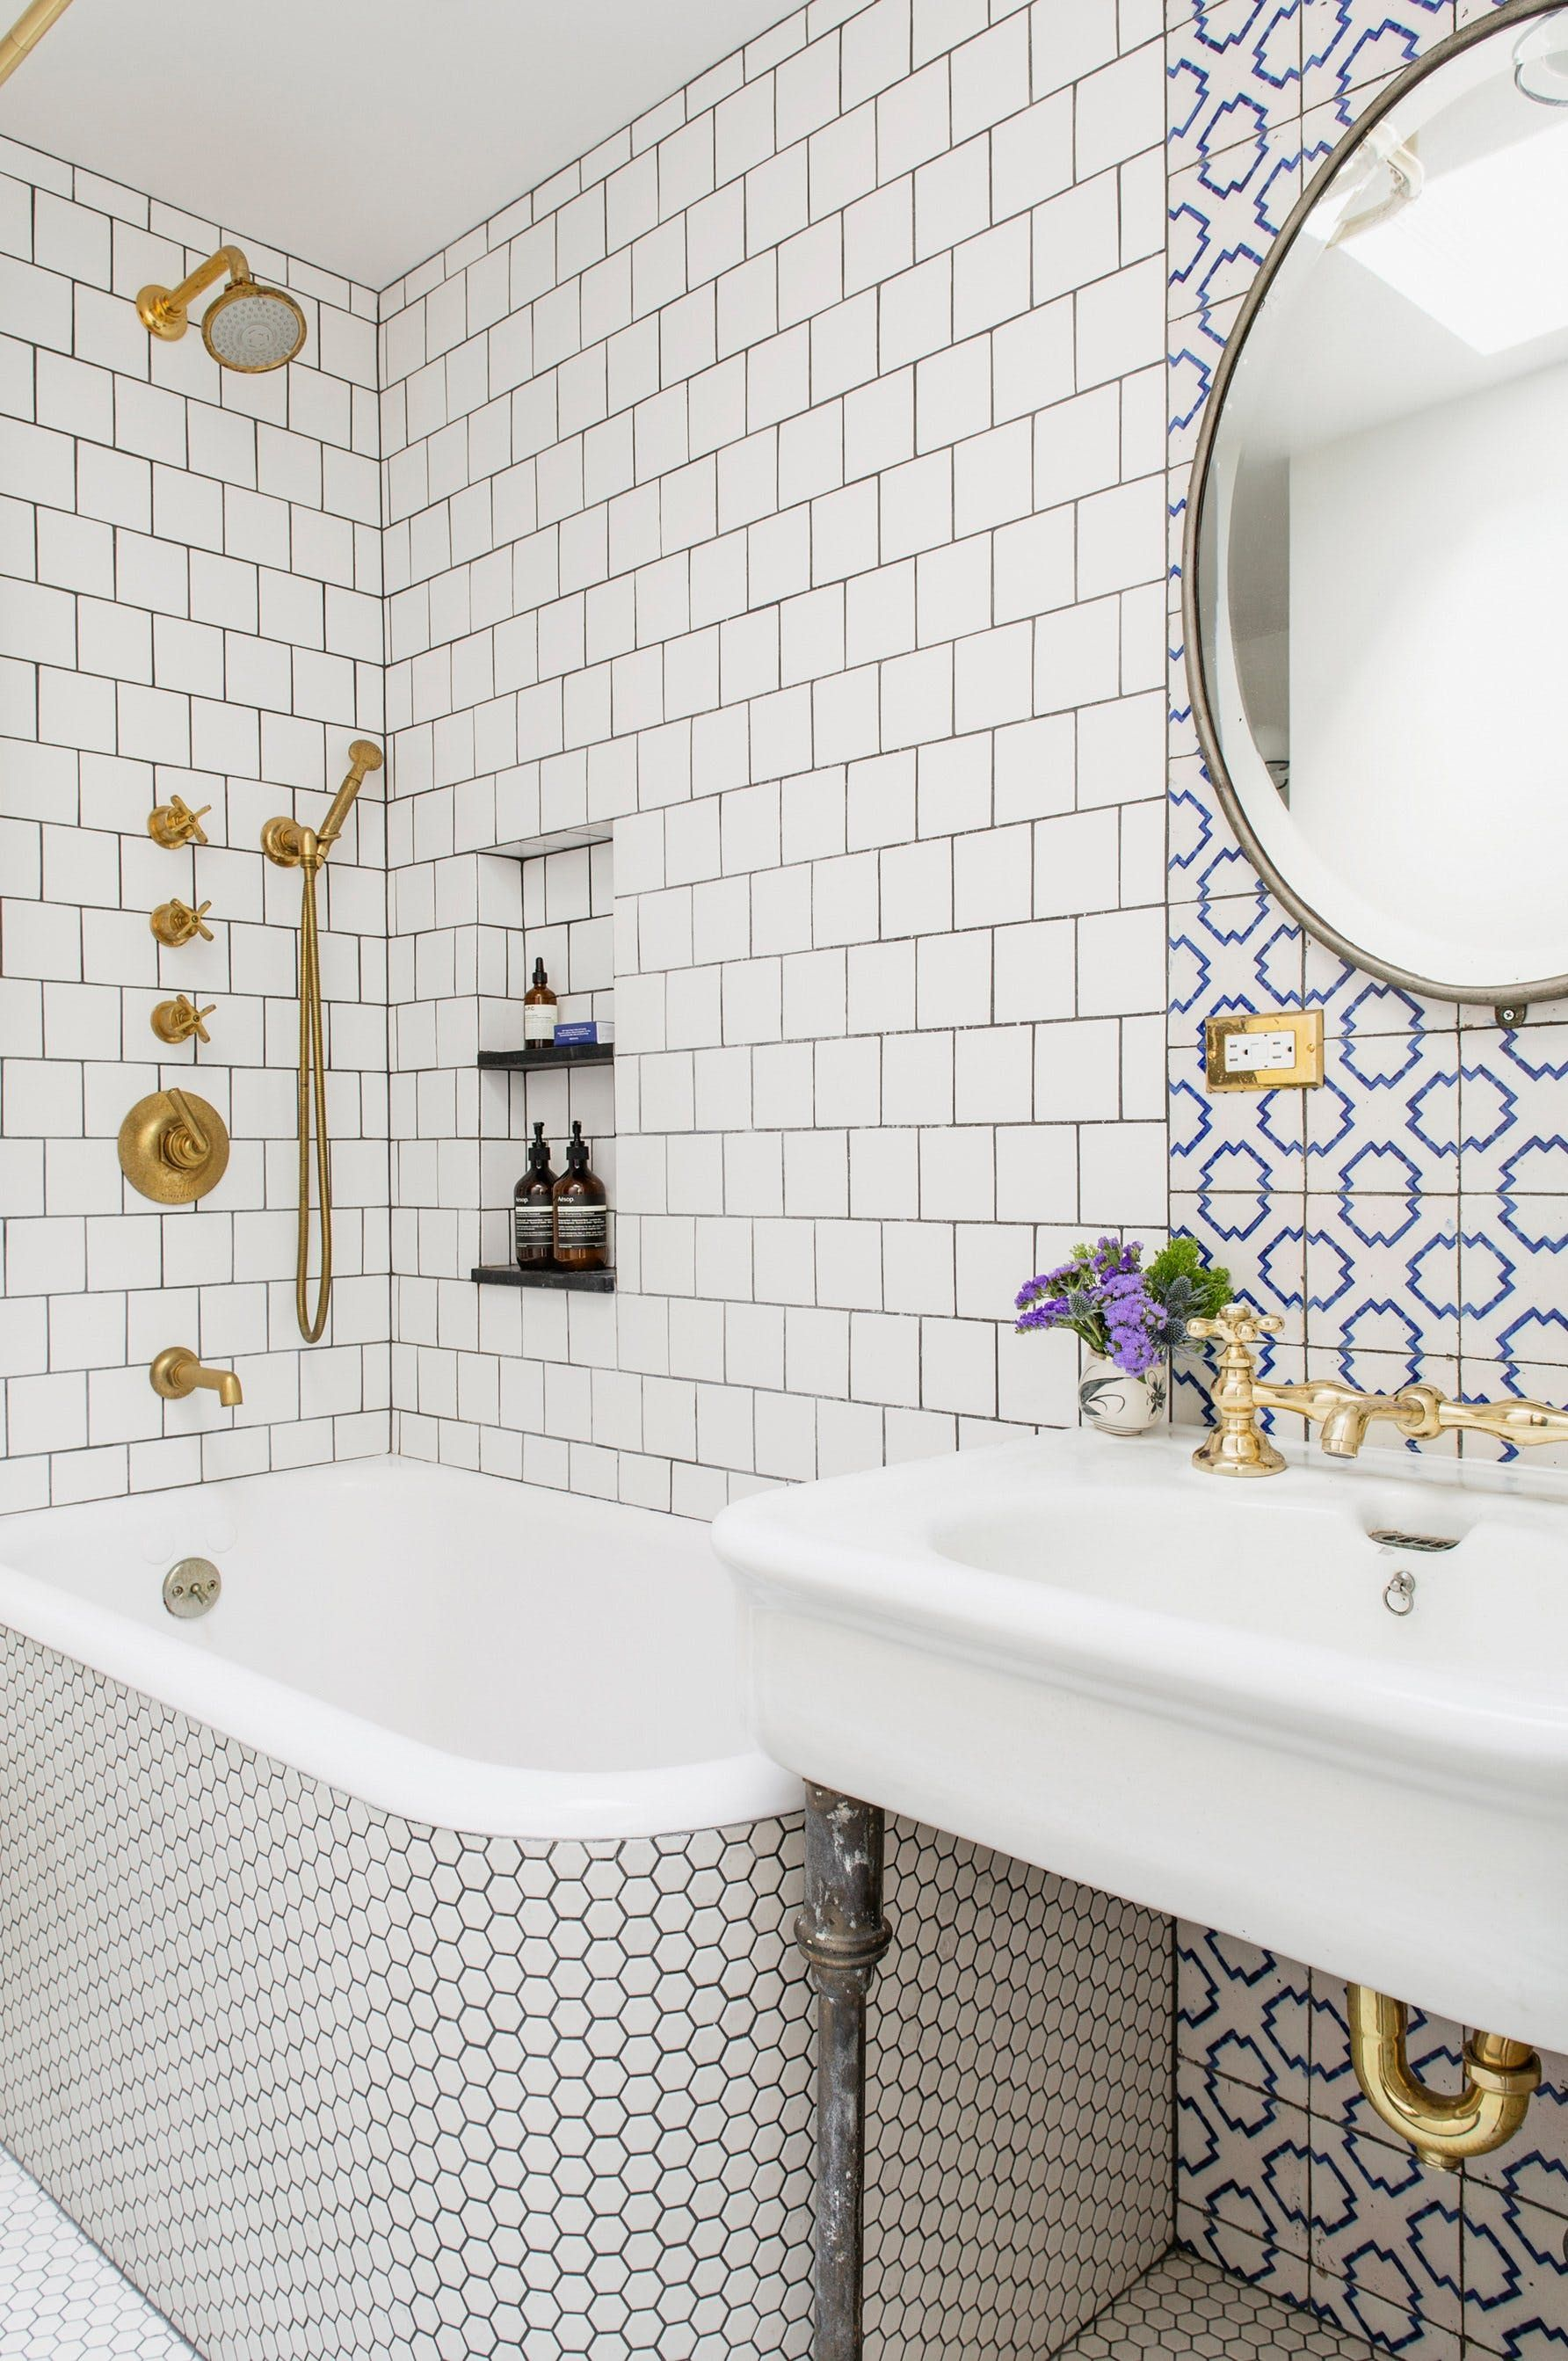 Stylish Remodeling Ideas for Small Bathrooms | Small bathroom, Bath ...